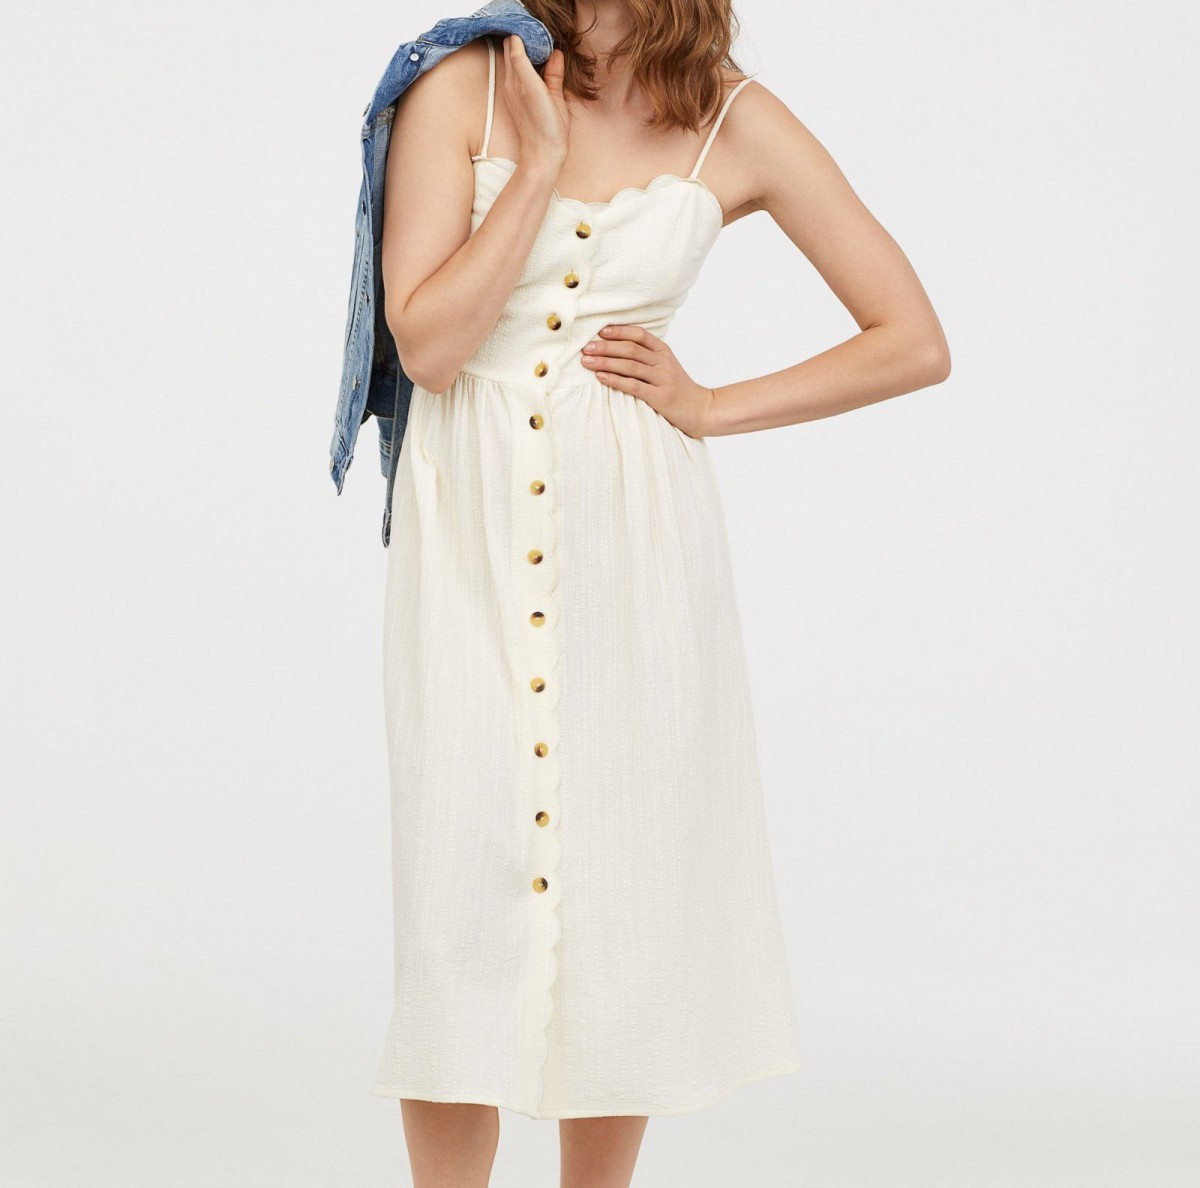 Vestido 'midi' de botones de H&M, por 39,99 euros.